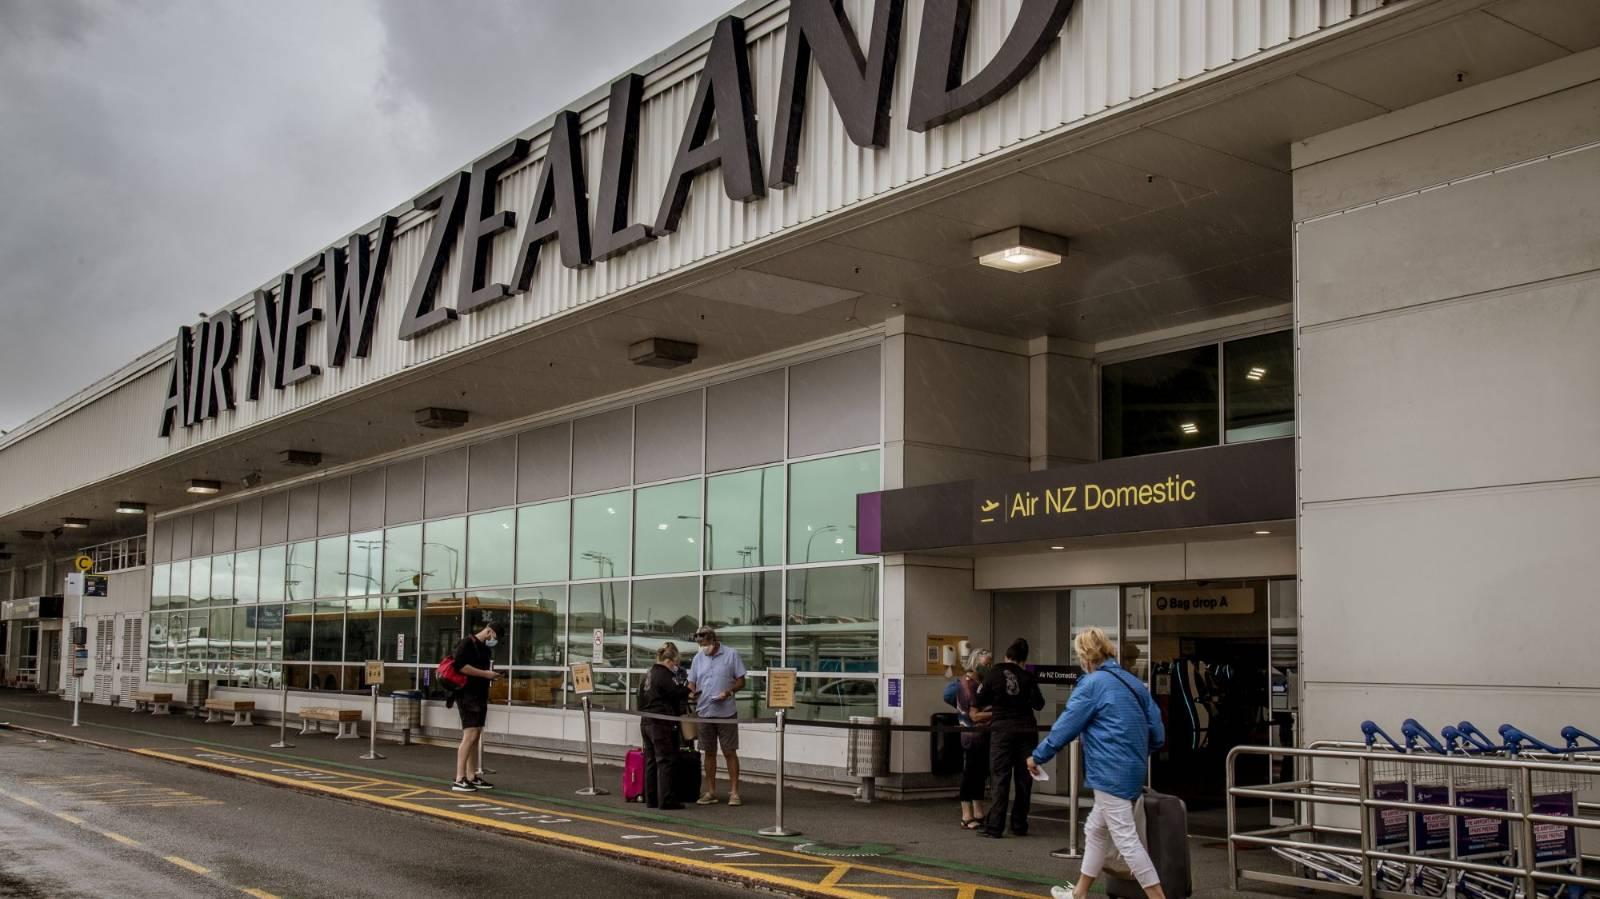 Booking Air NZ domestic flights will look a bit different